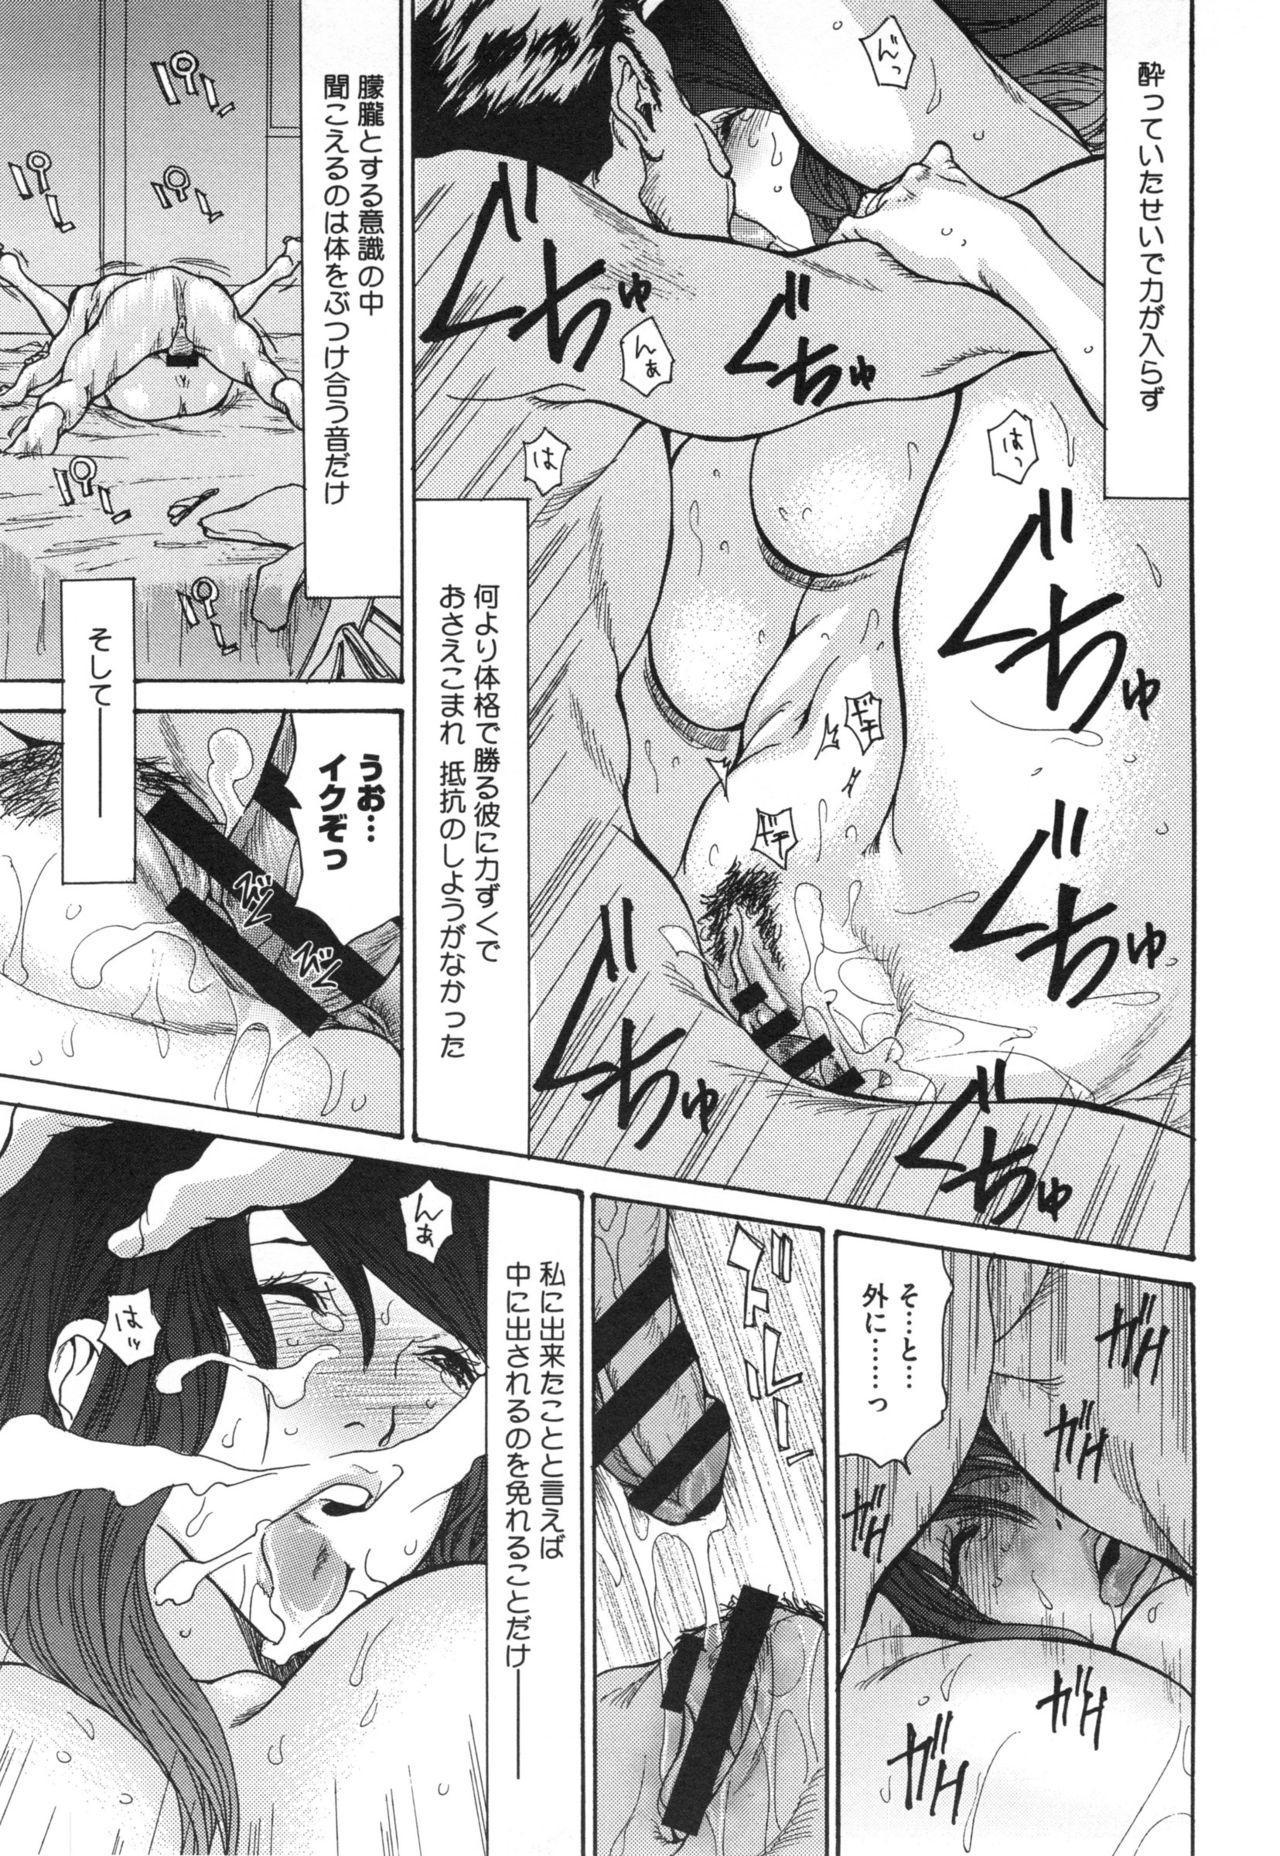 Niku-zuma Netorare Maniacs 53